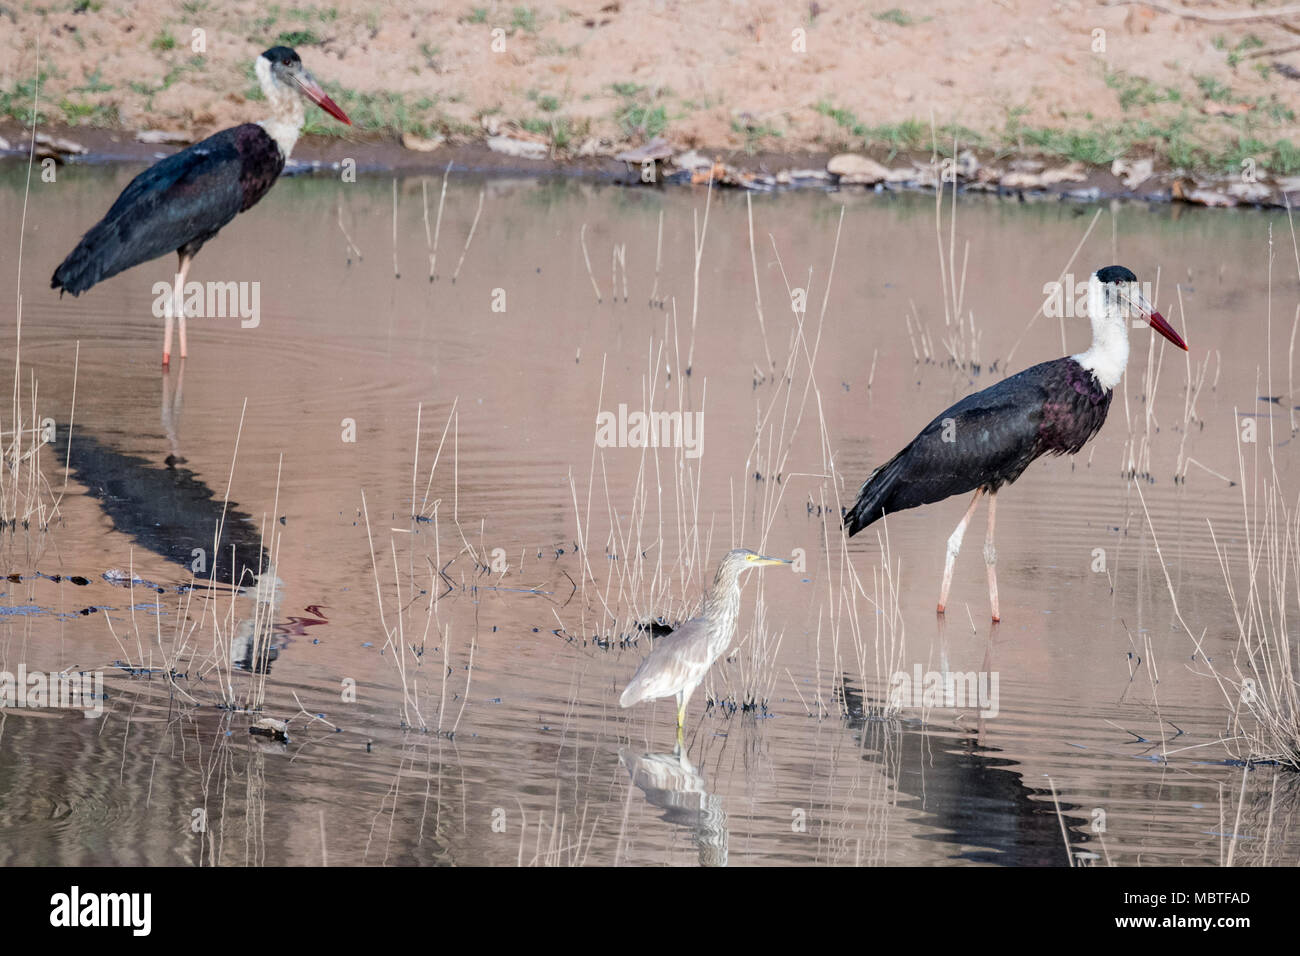 Two lesser adjutant storks, Leptopilos dubious, and an Indian pond heron, Ardeola grayii, in a pond, Bandhavgarh National Park, Madhya Pradesh, India - Stock Image